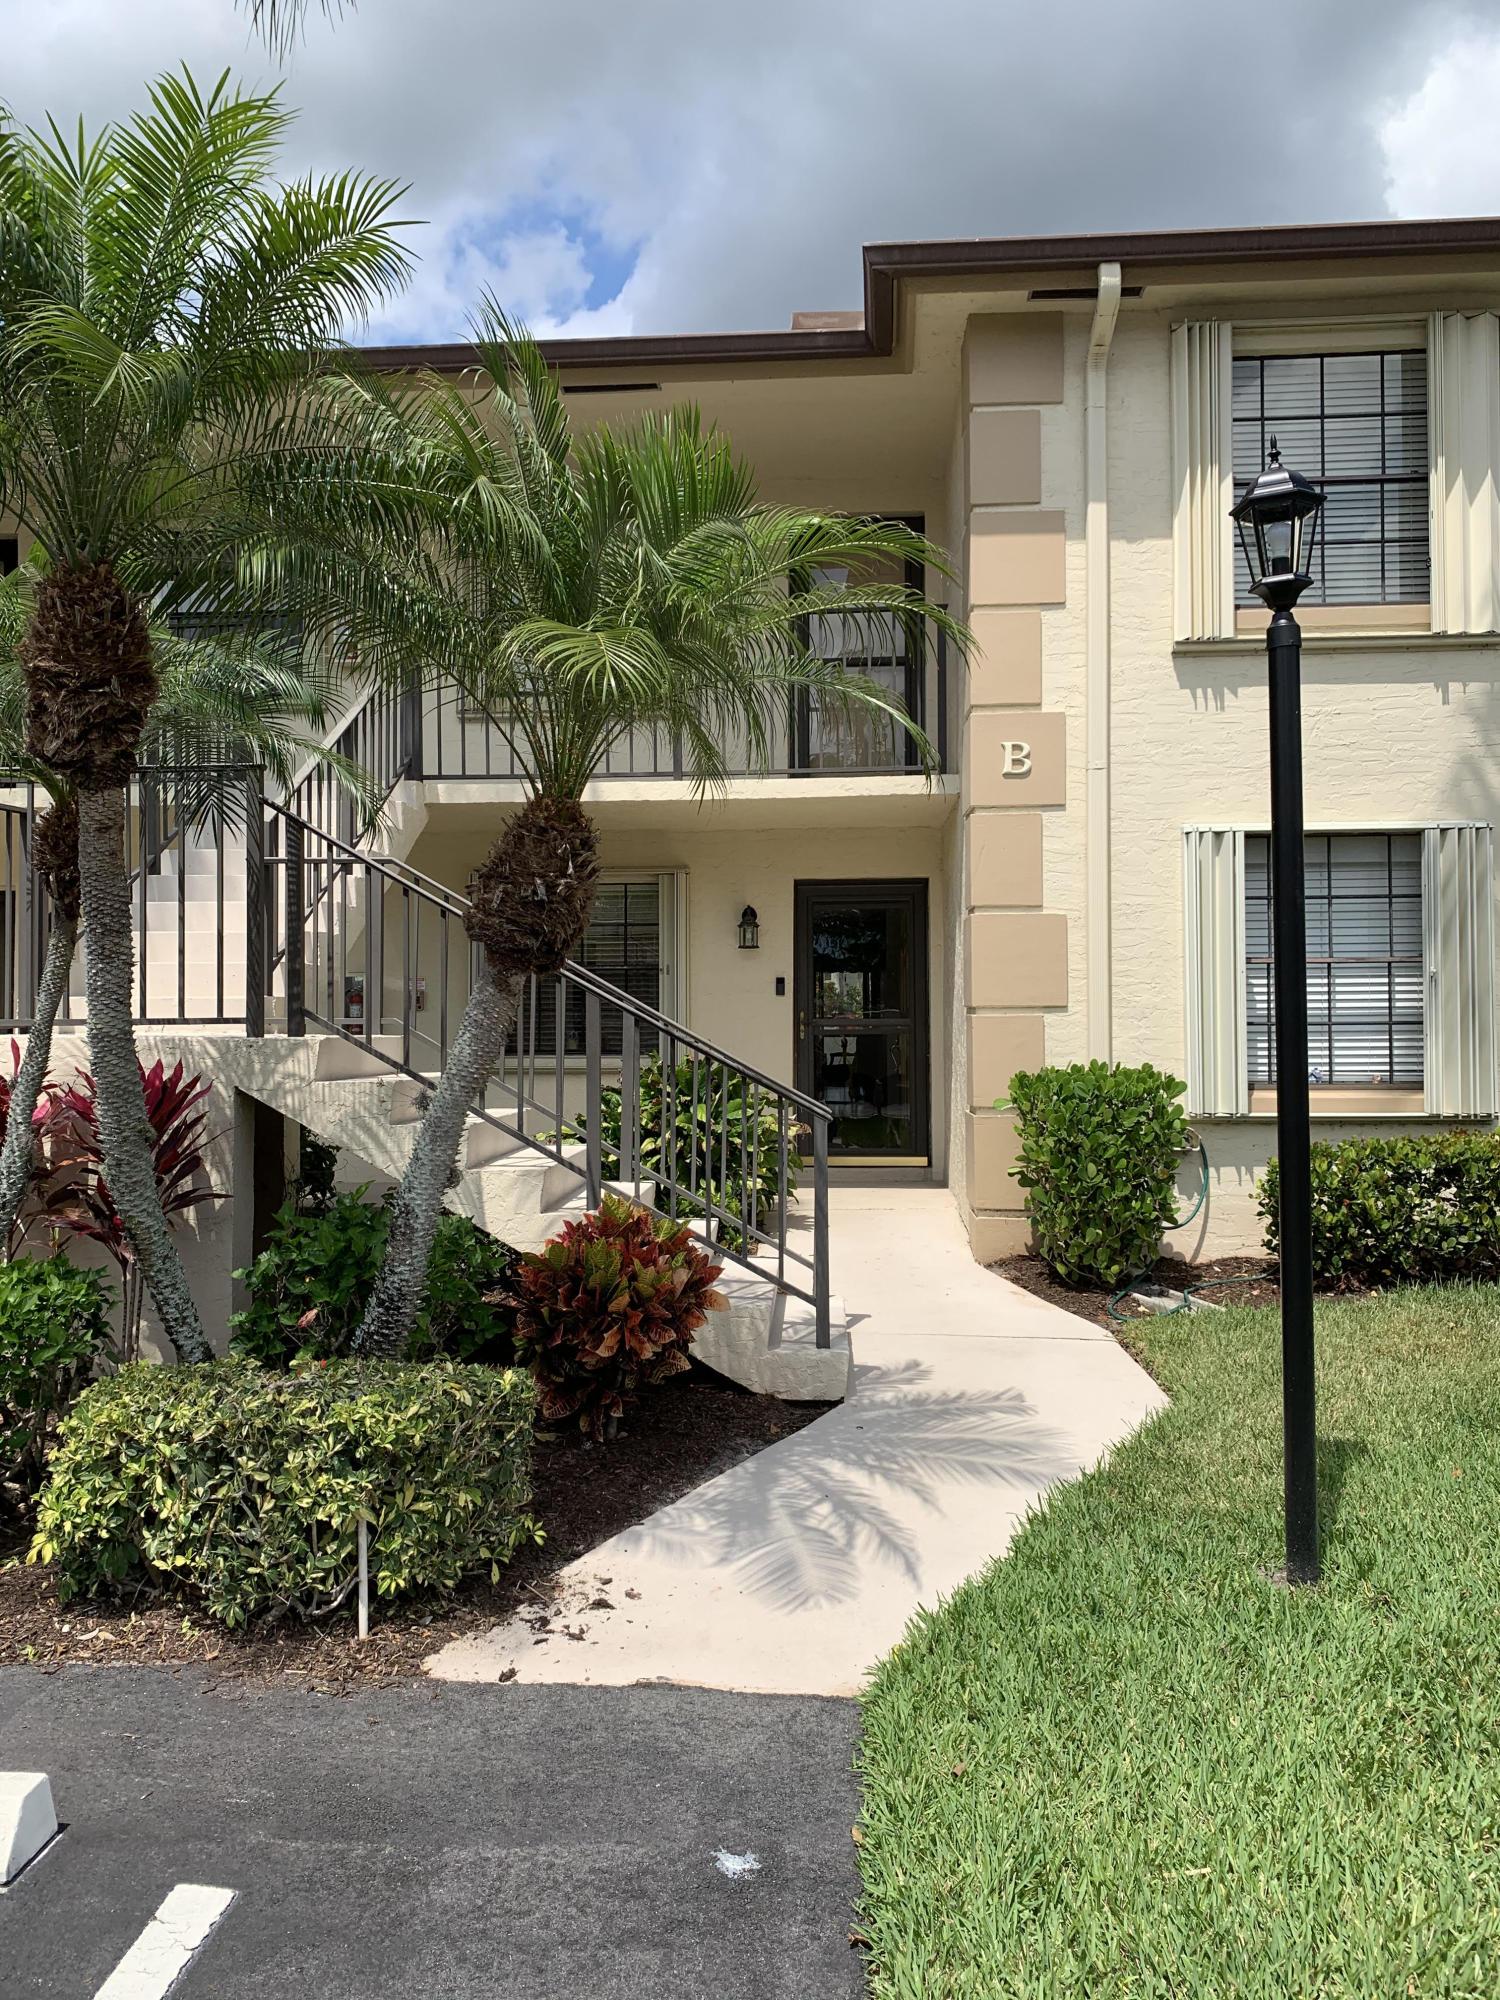 Home for sale in pine crest condo Jupiter Florida